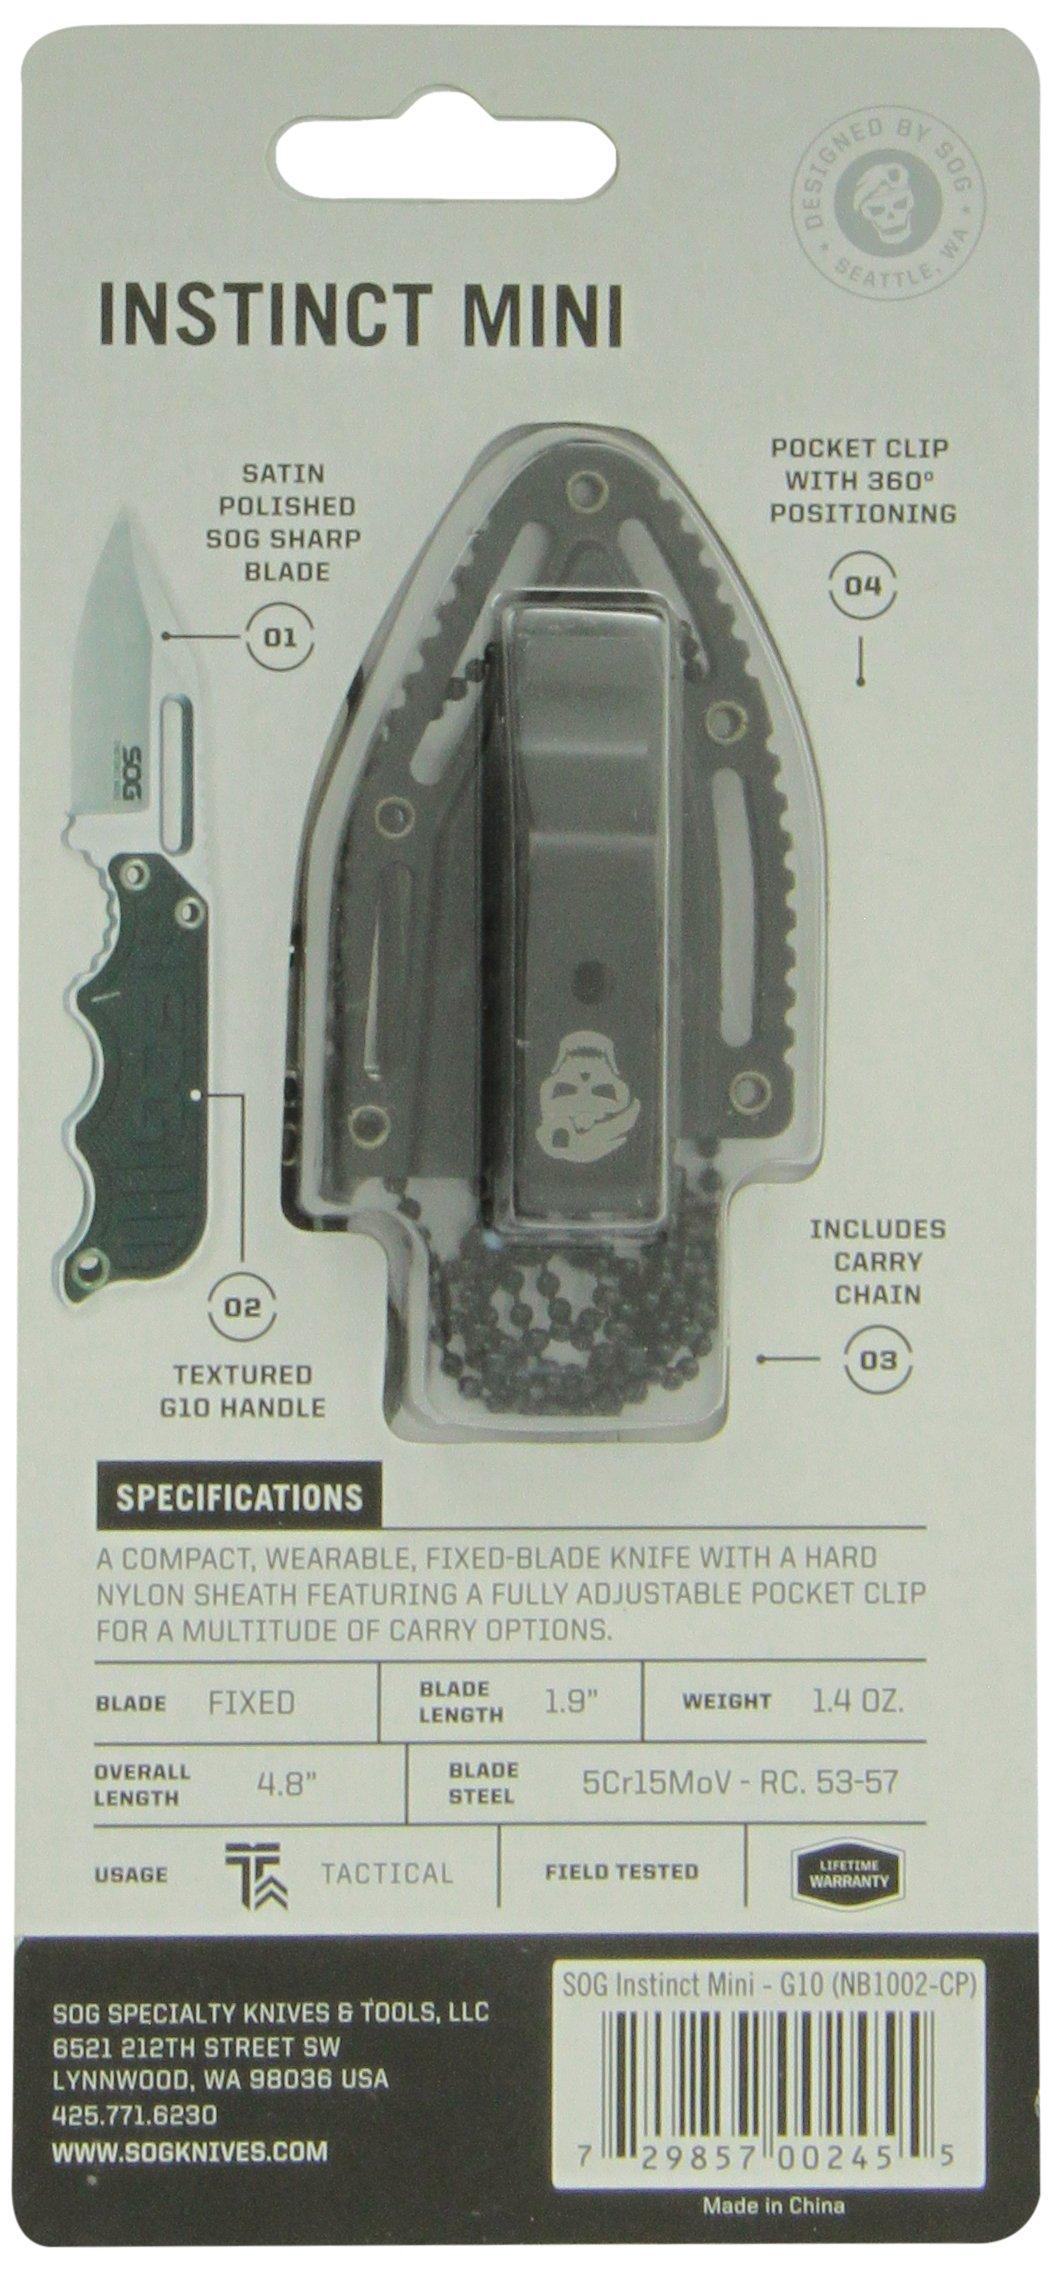 SOG Instinct Mini Fixed Blade NB1002-CP - Satin Polished 1.9'' Blade, Neck/Boot Carry, G10 Handle, Hard Molded Nylon Sheath